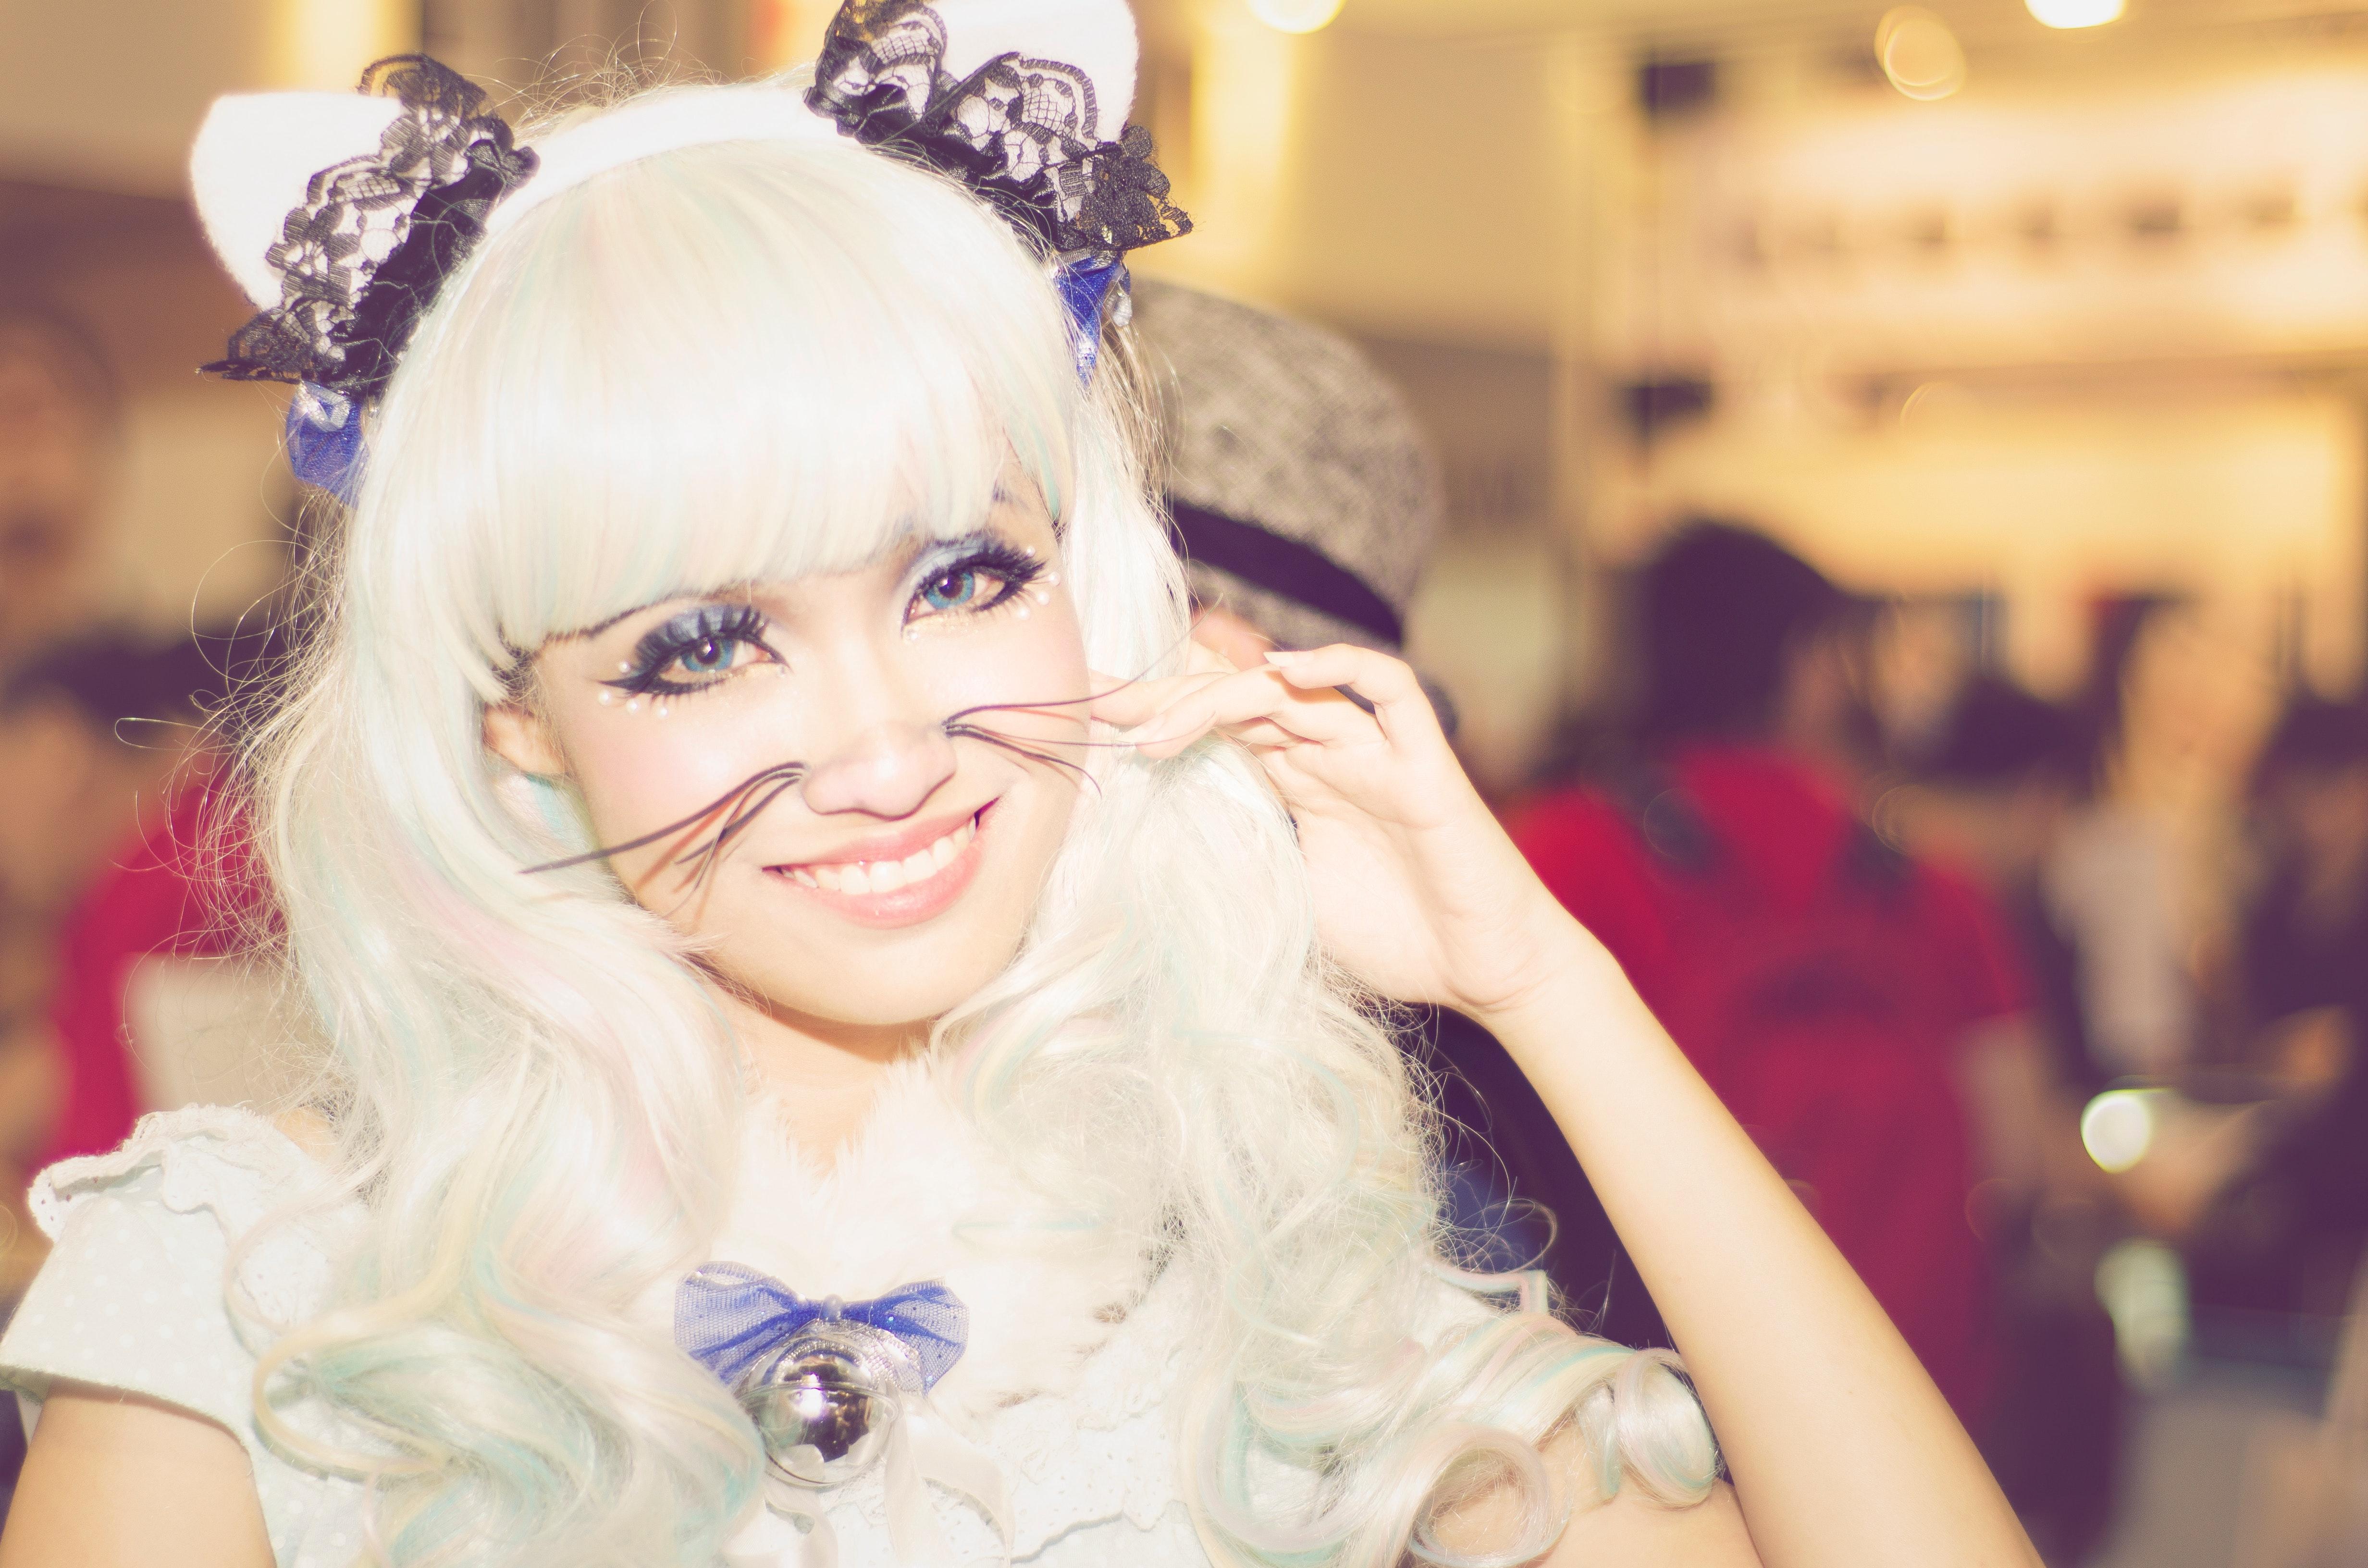 Woman wearing white anime character costume photo